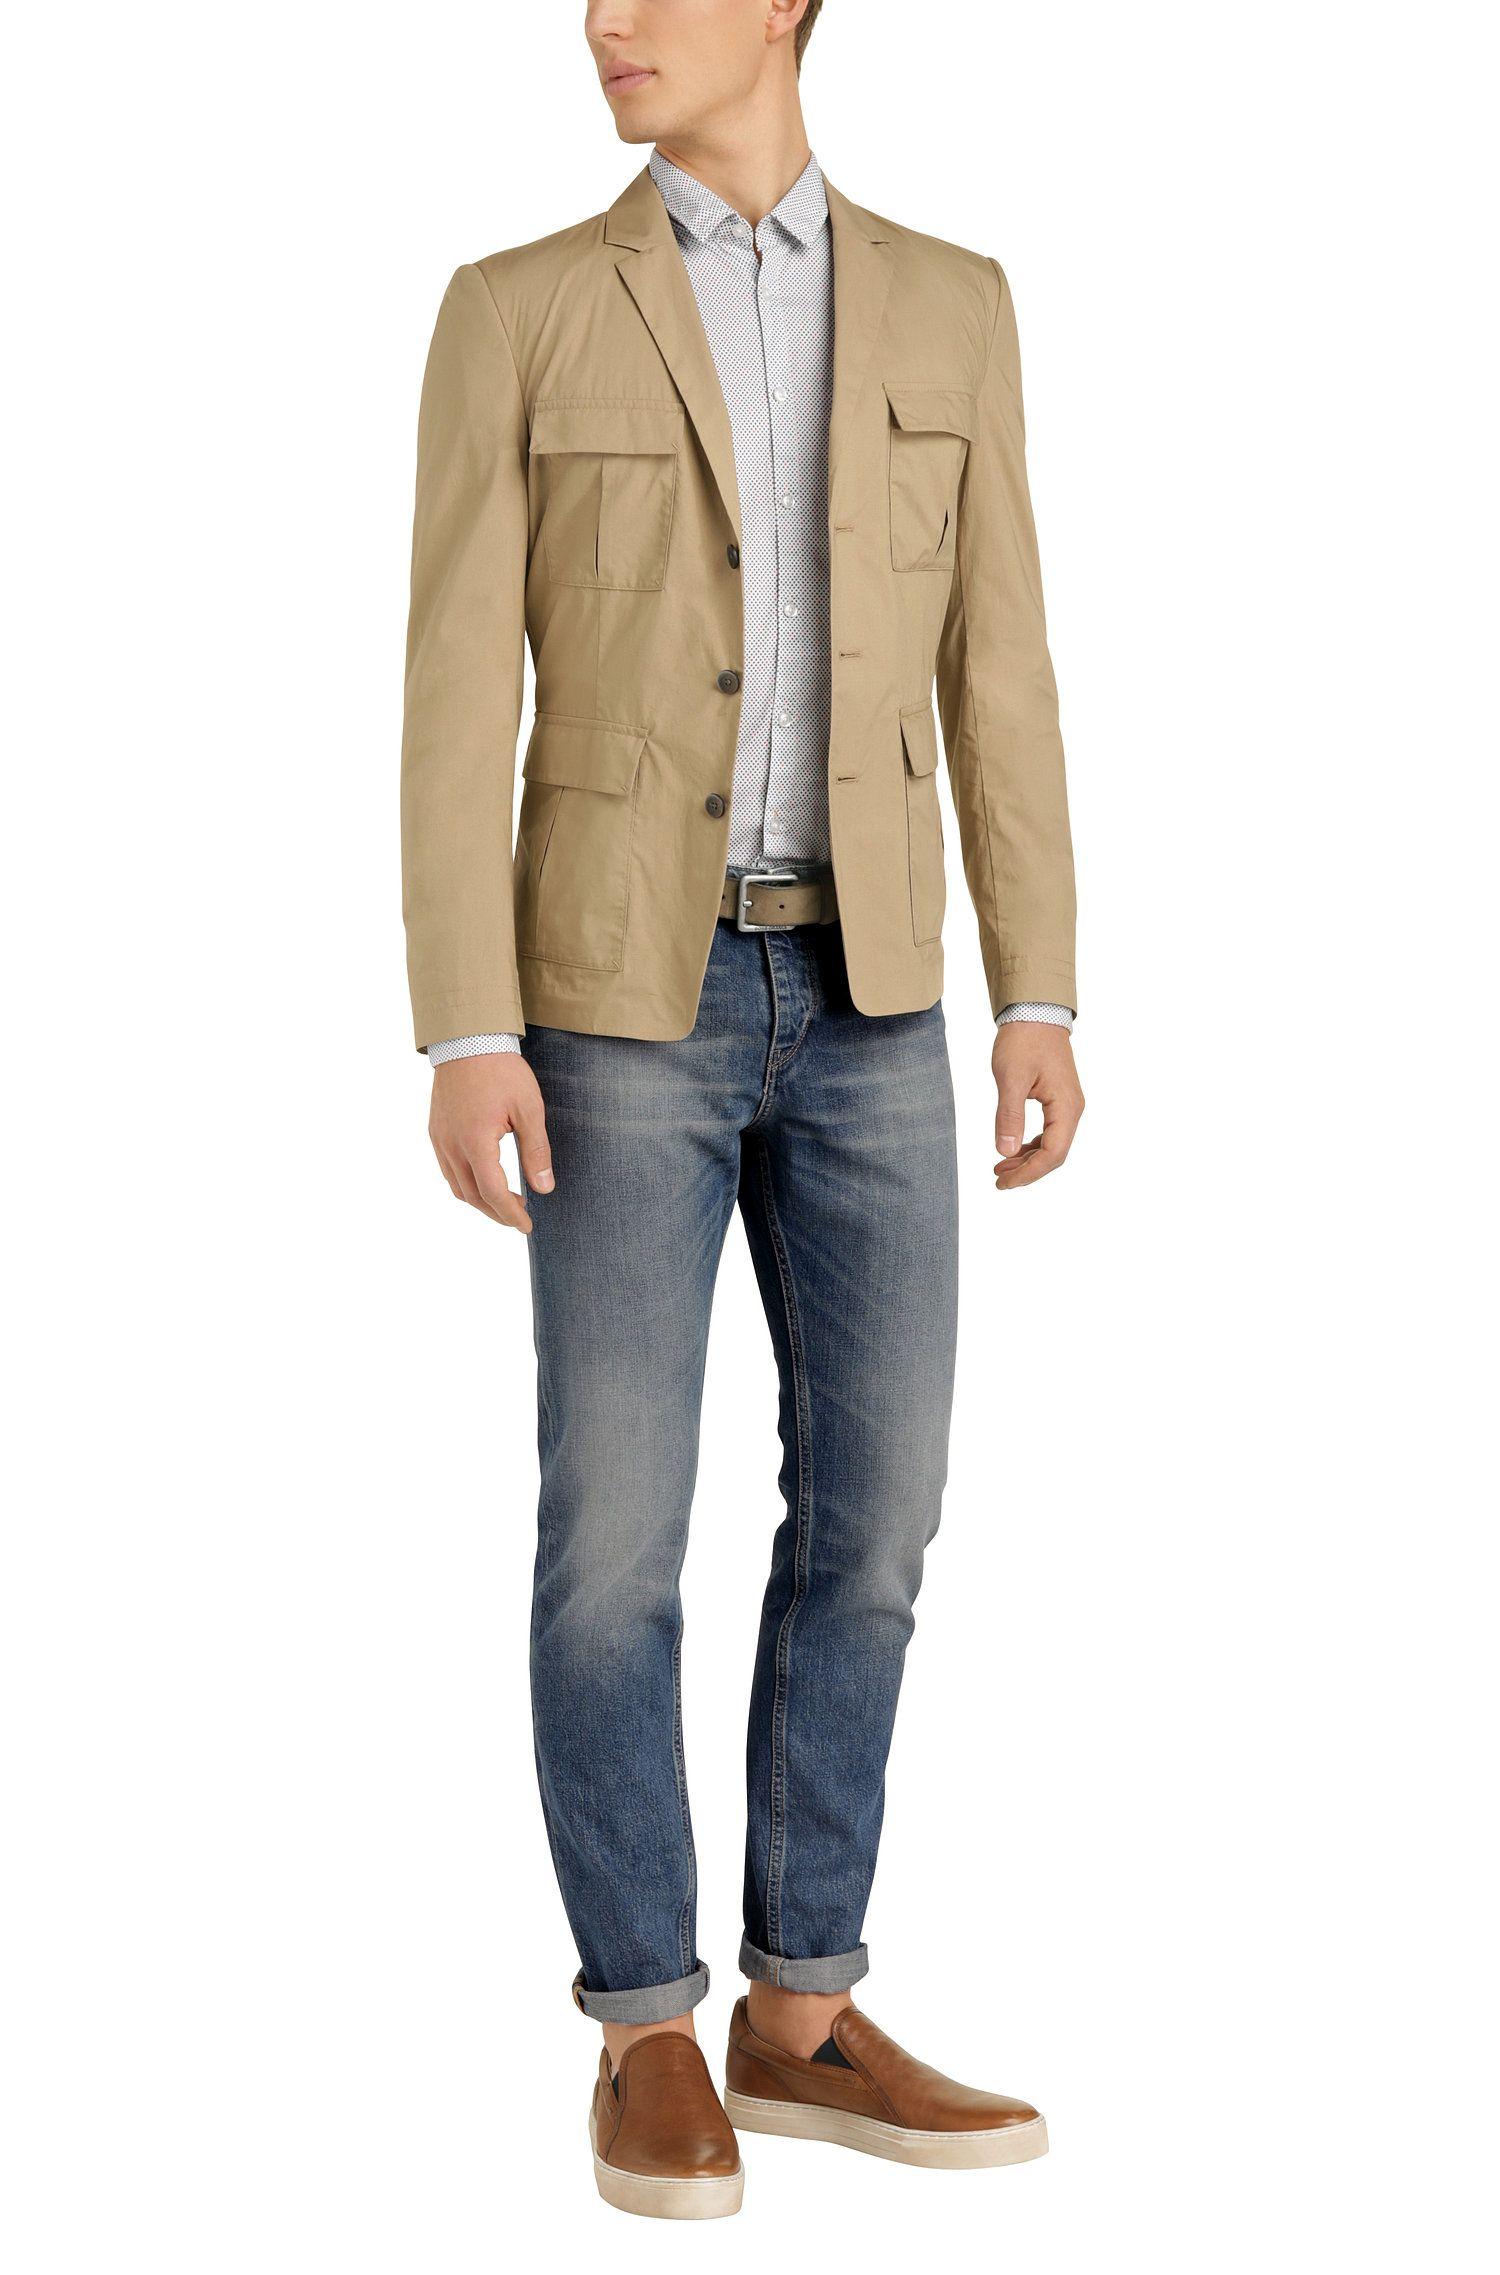 Cotton Blend Jean, Slim Fit | Orange90